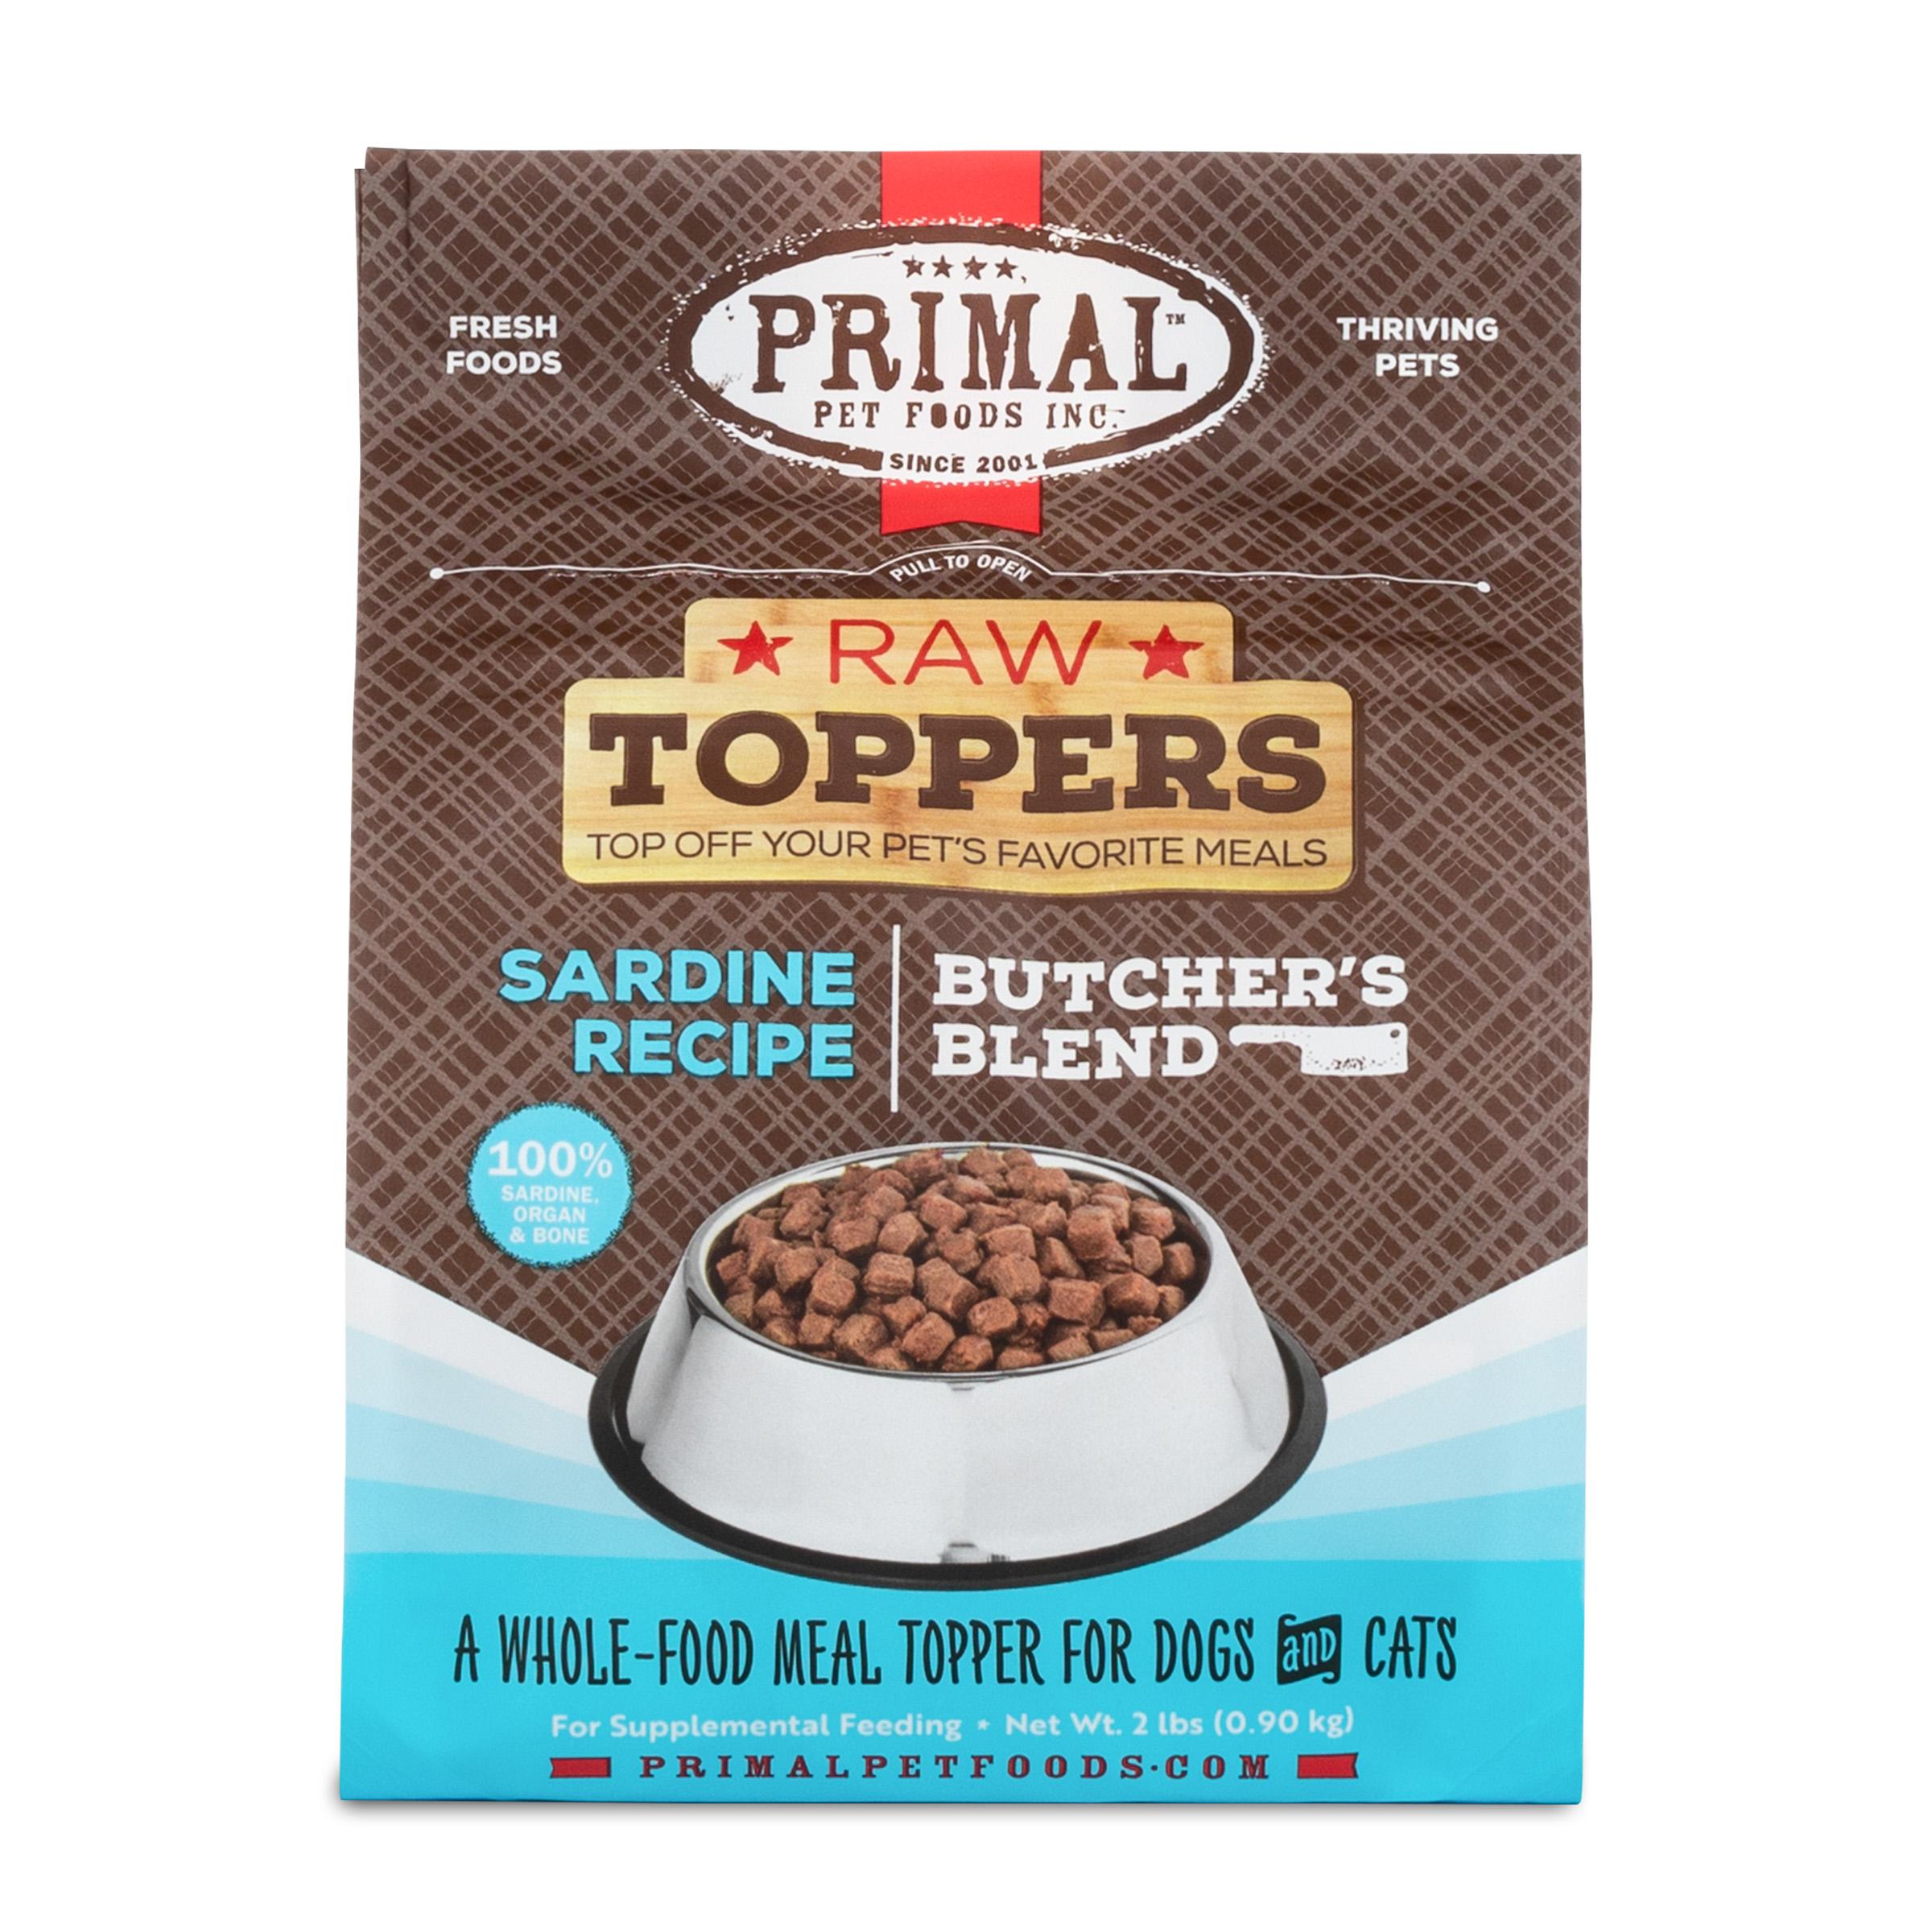 Primal Sardine Butcher's Blend Topper, 2-lb